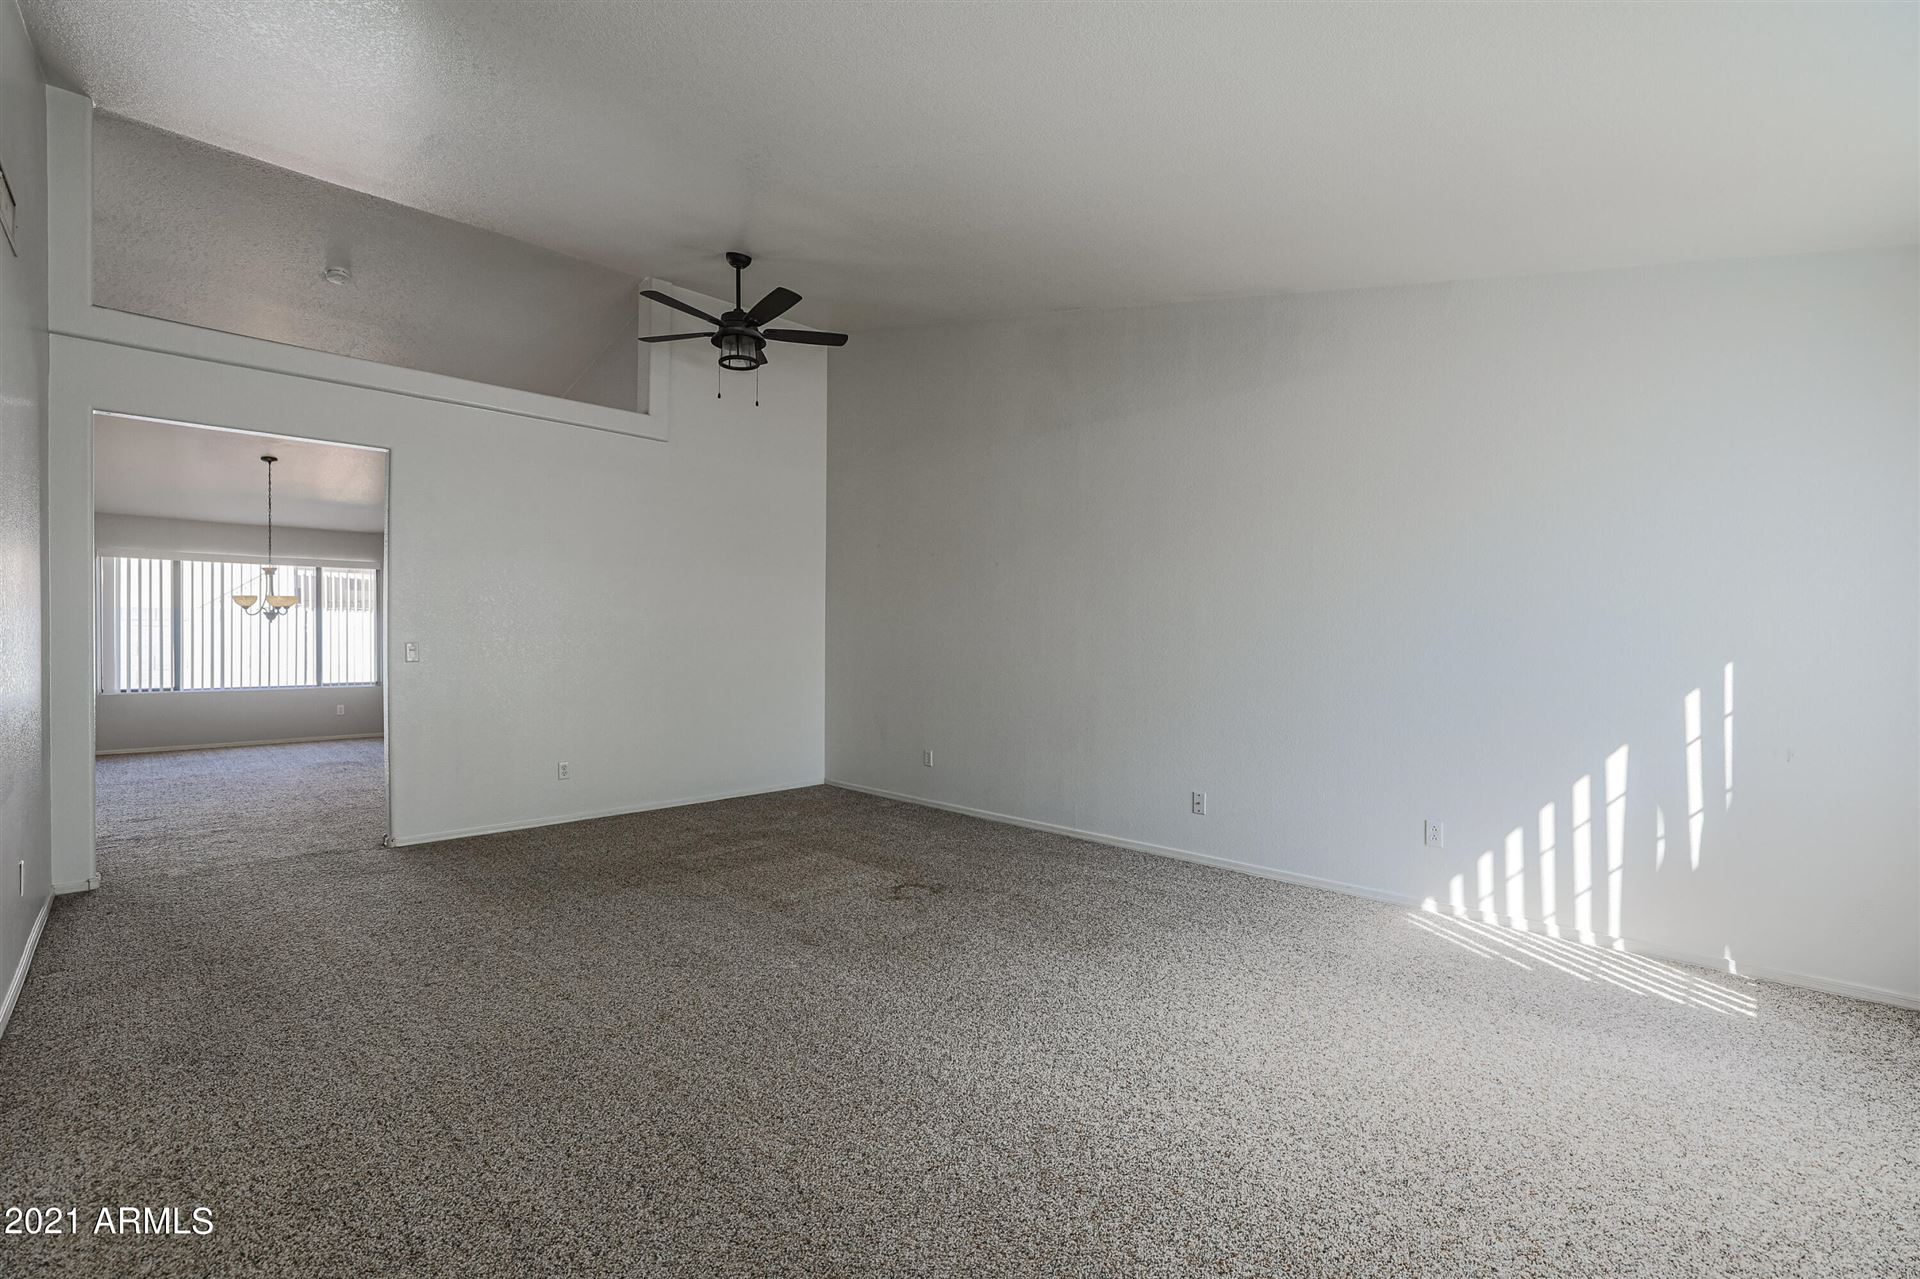 Photo of 556 W MESQUITE Street, Gilbert, AZ 85233 (MLS # 6307675)